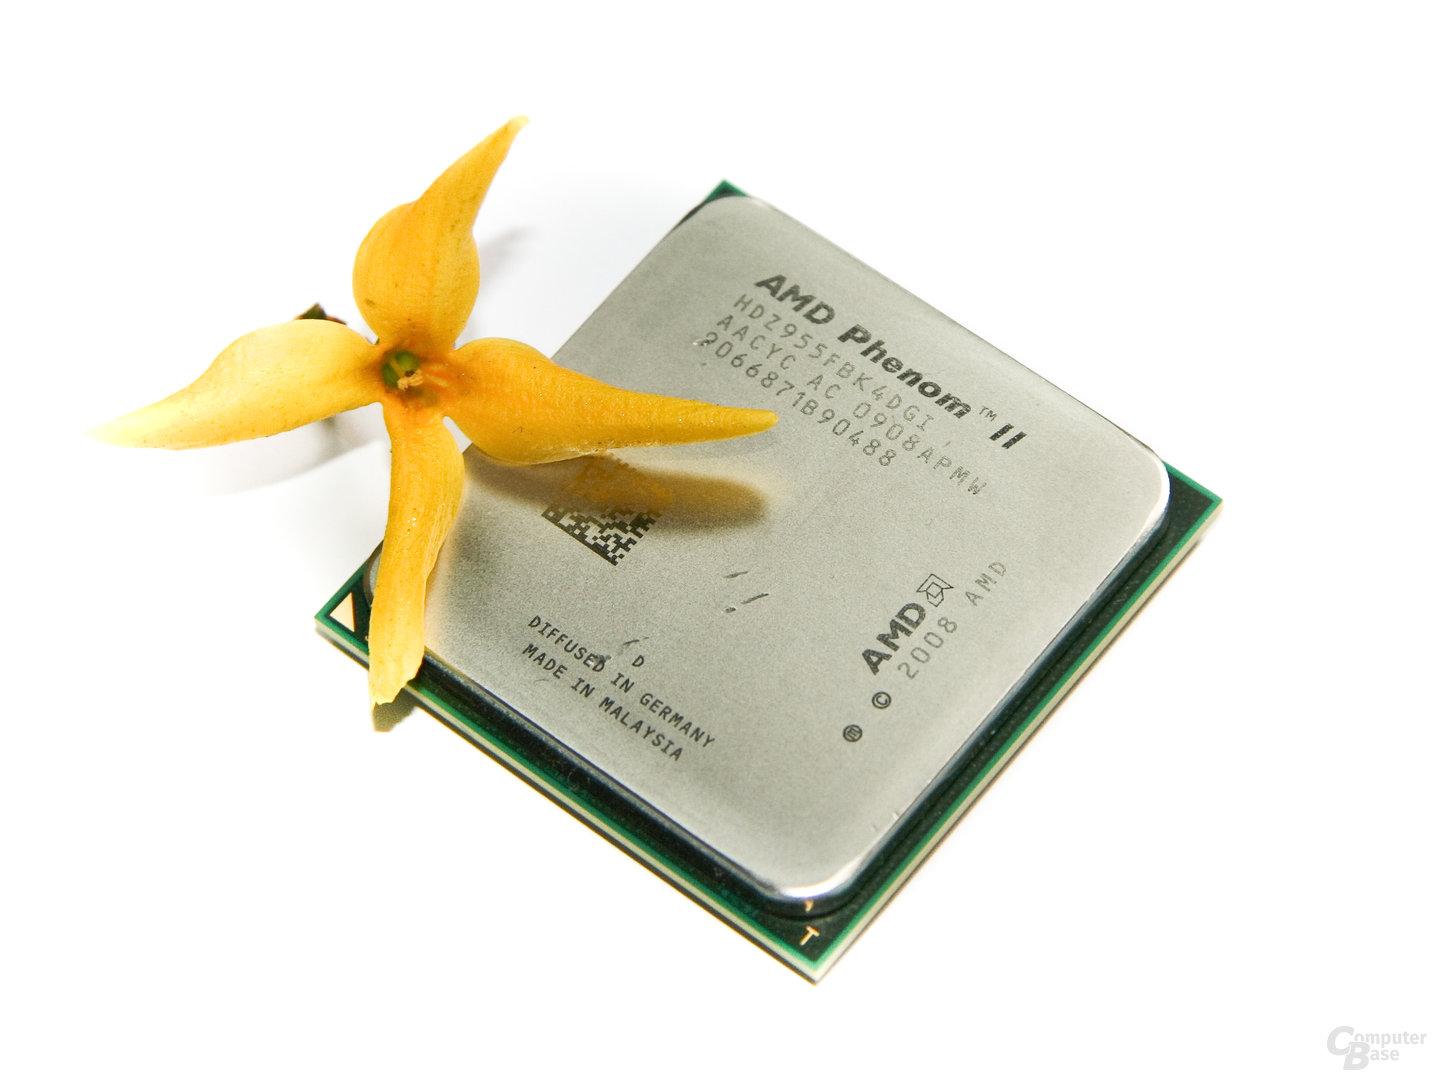 AMD Phenom II X4 955 Black Edition